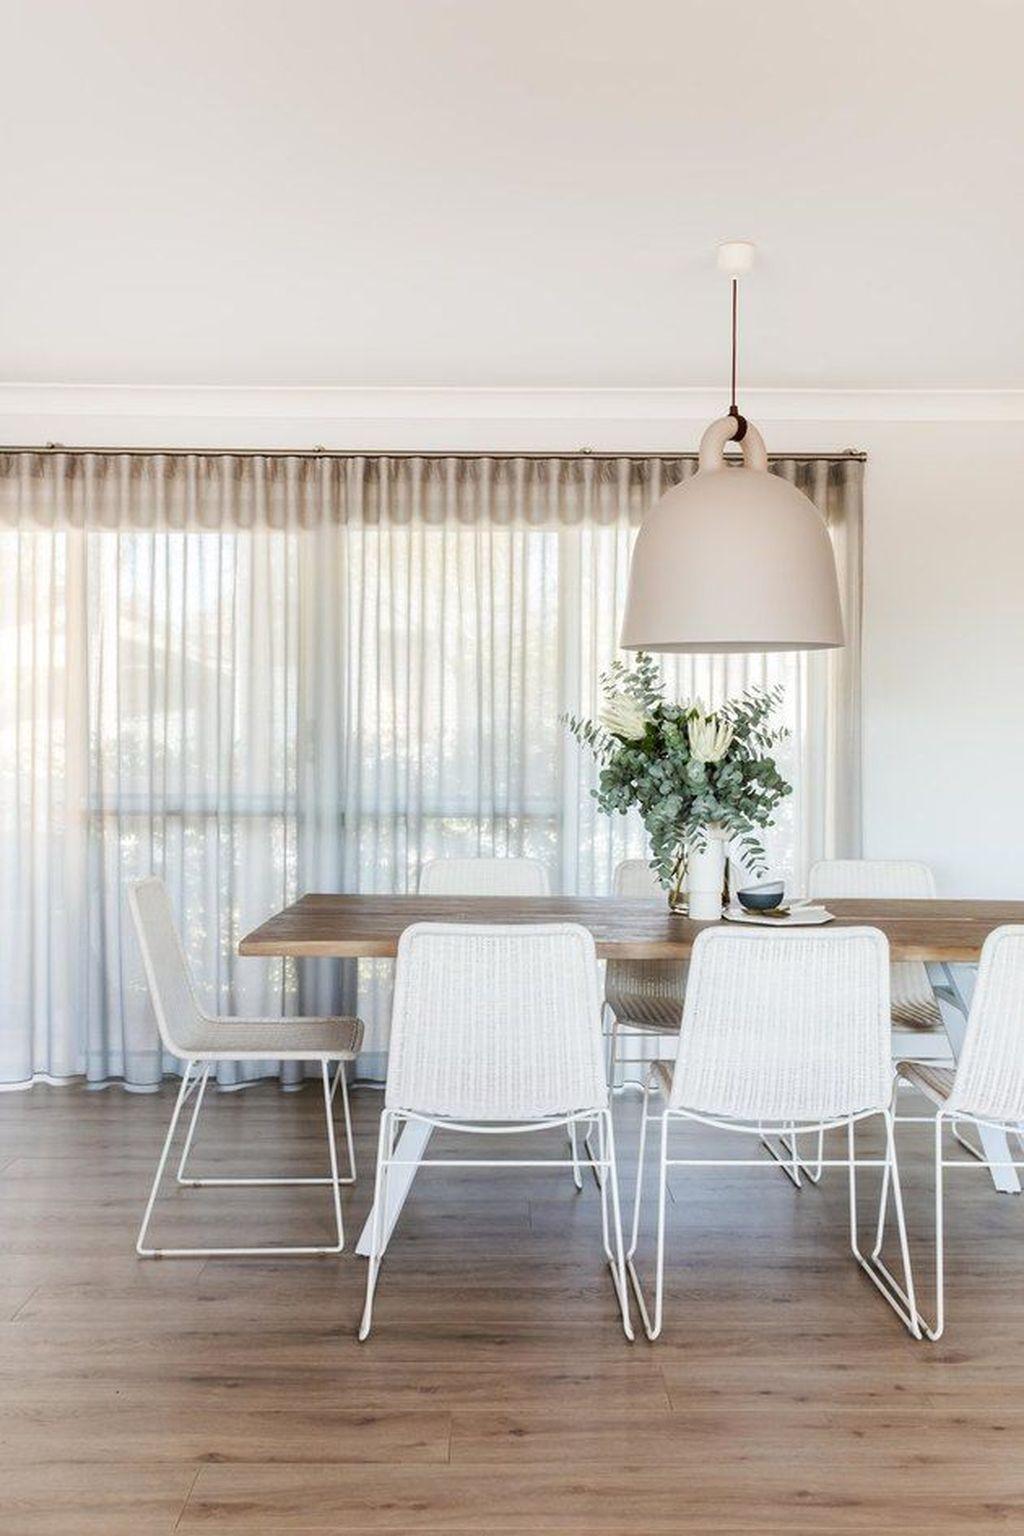 Admirable Dining Room Design Ideas 07